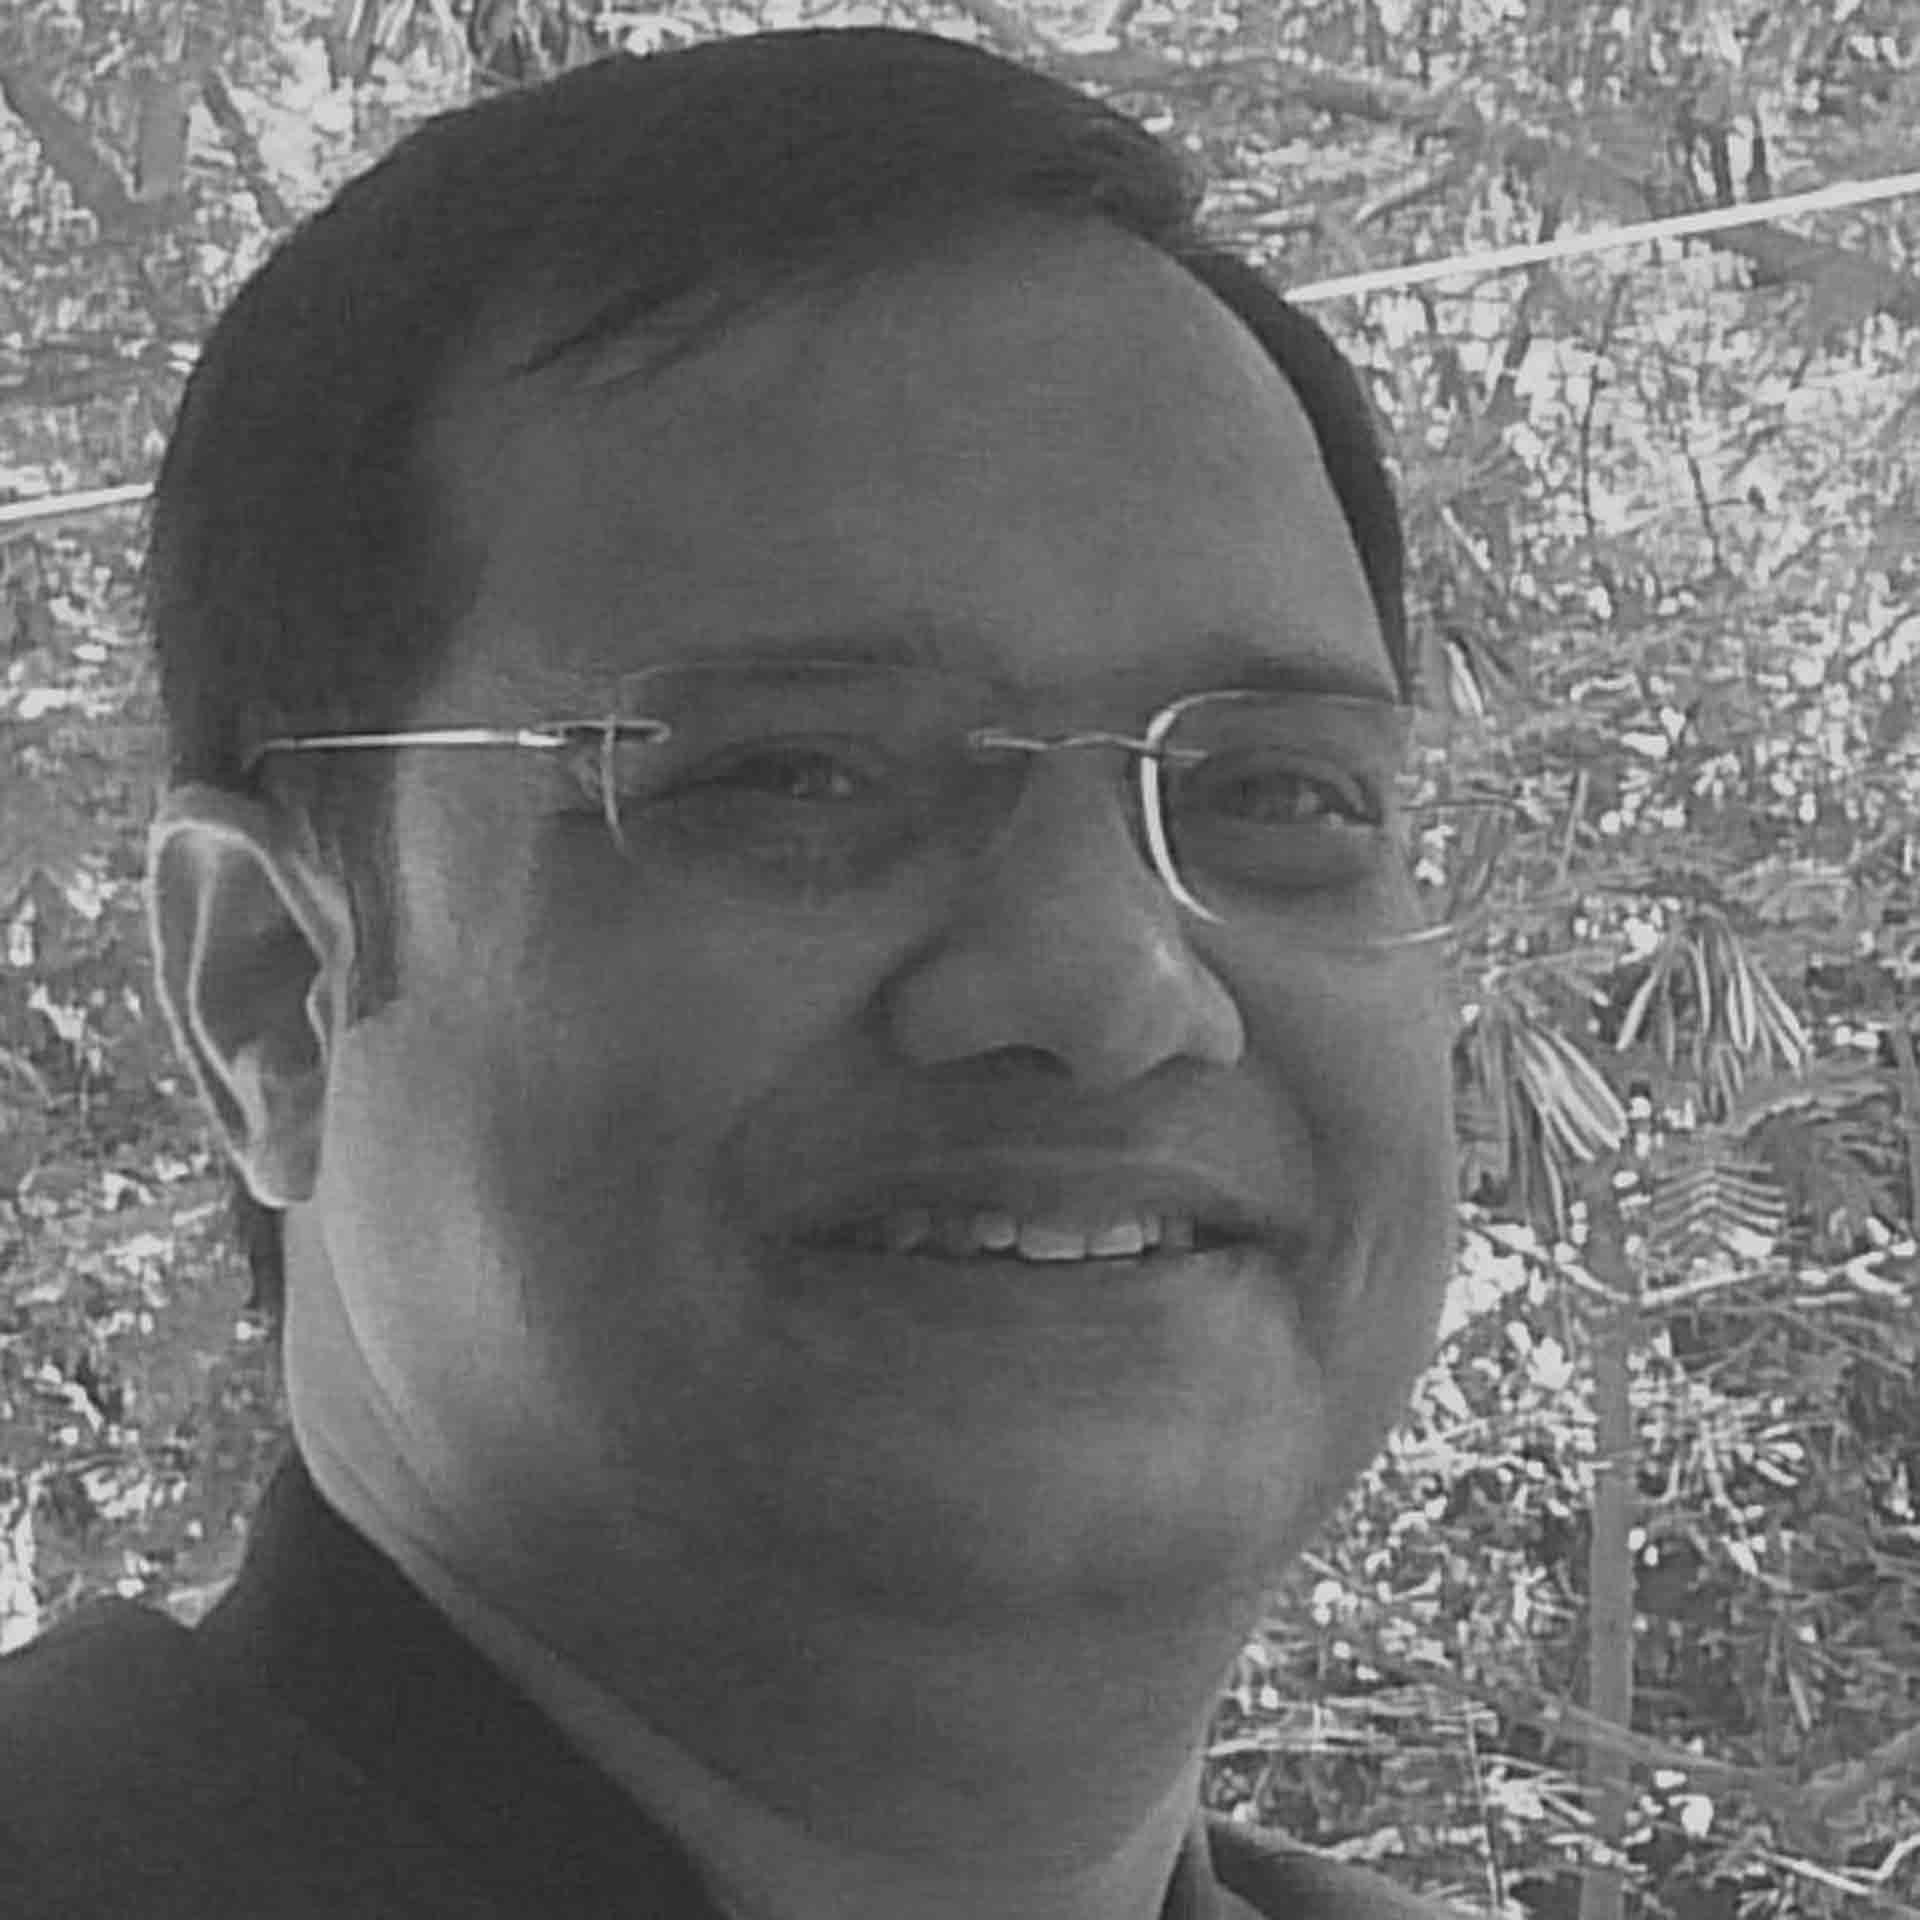 Sridhar Srigiriraju